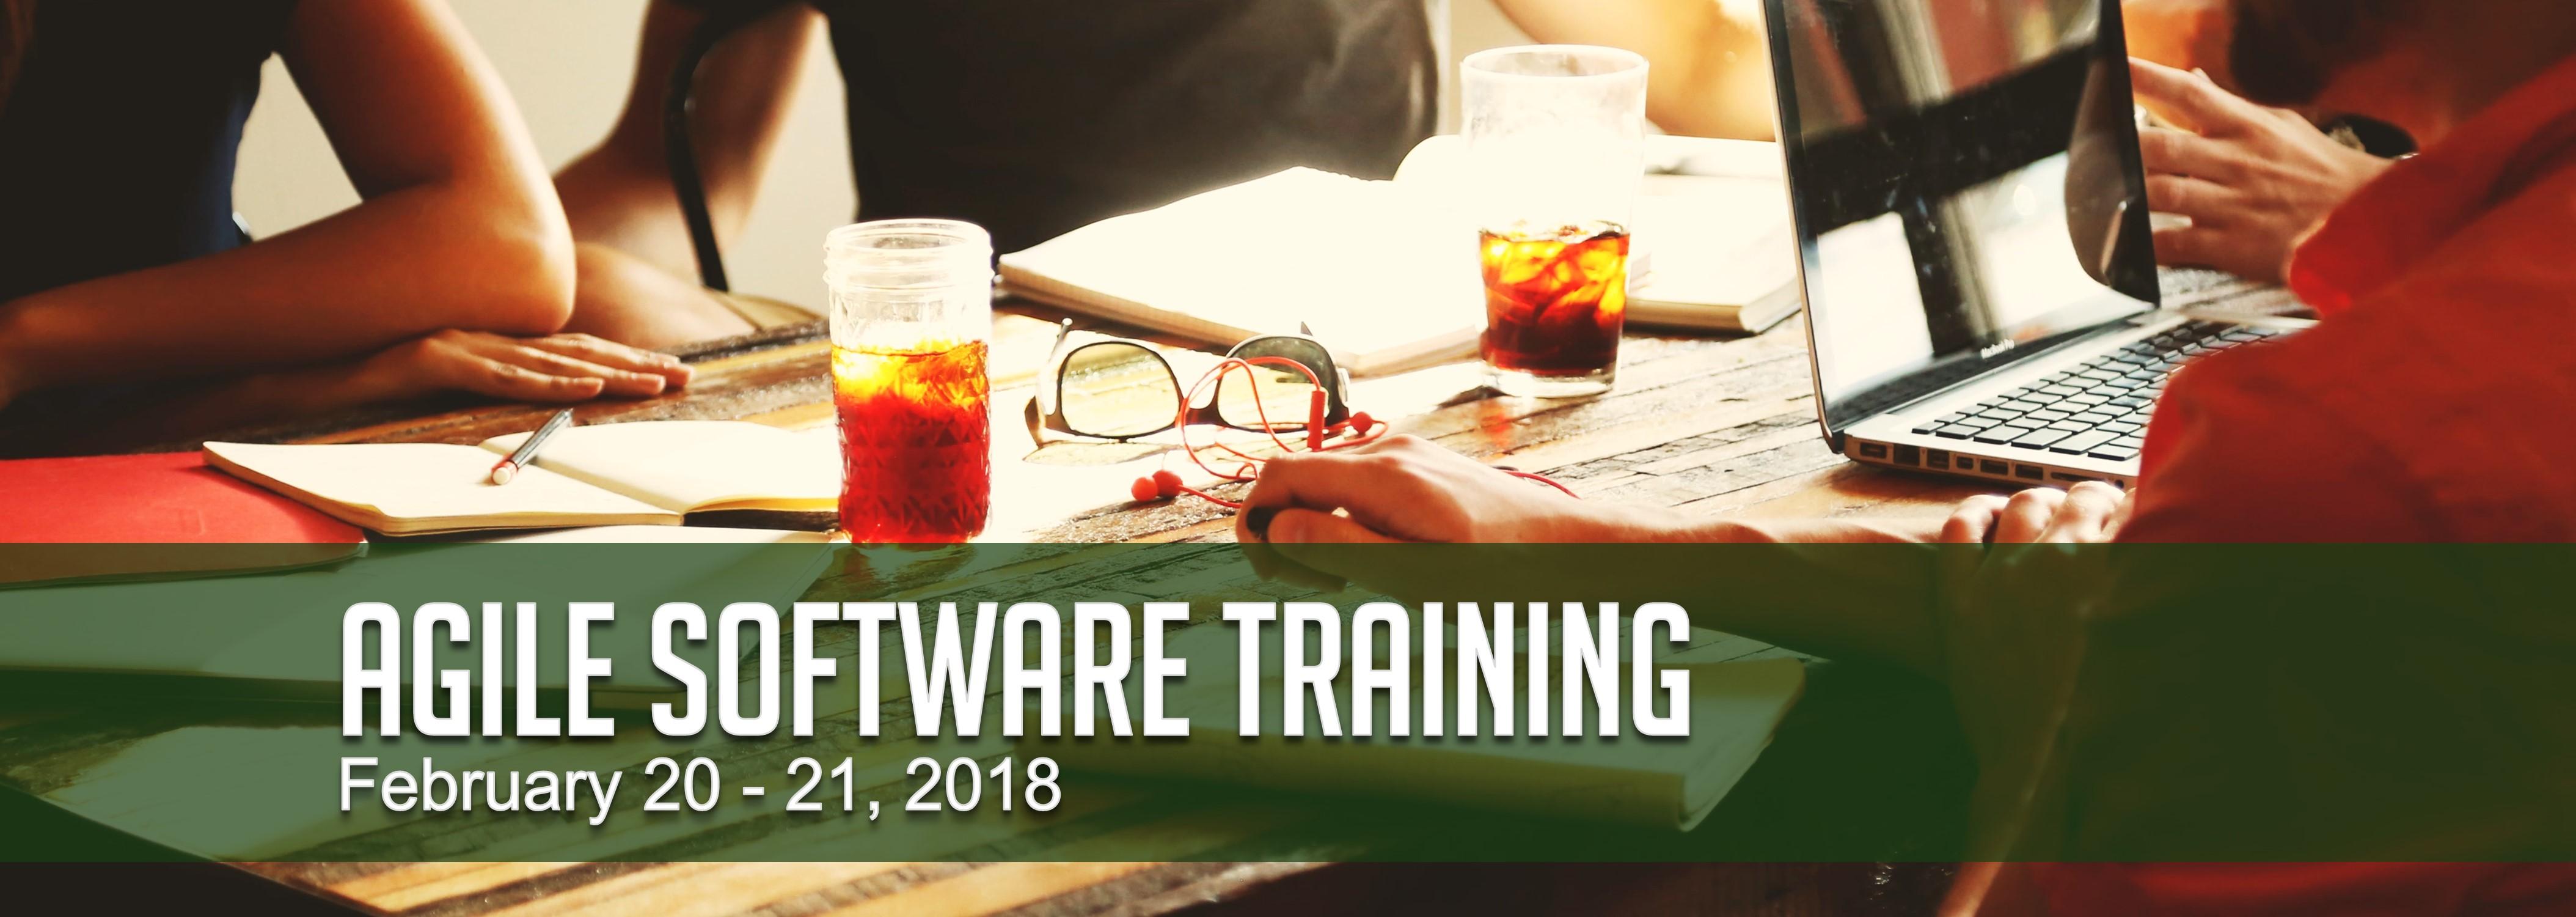 Agile Software Training on February 20 - 21, 2018